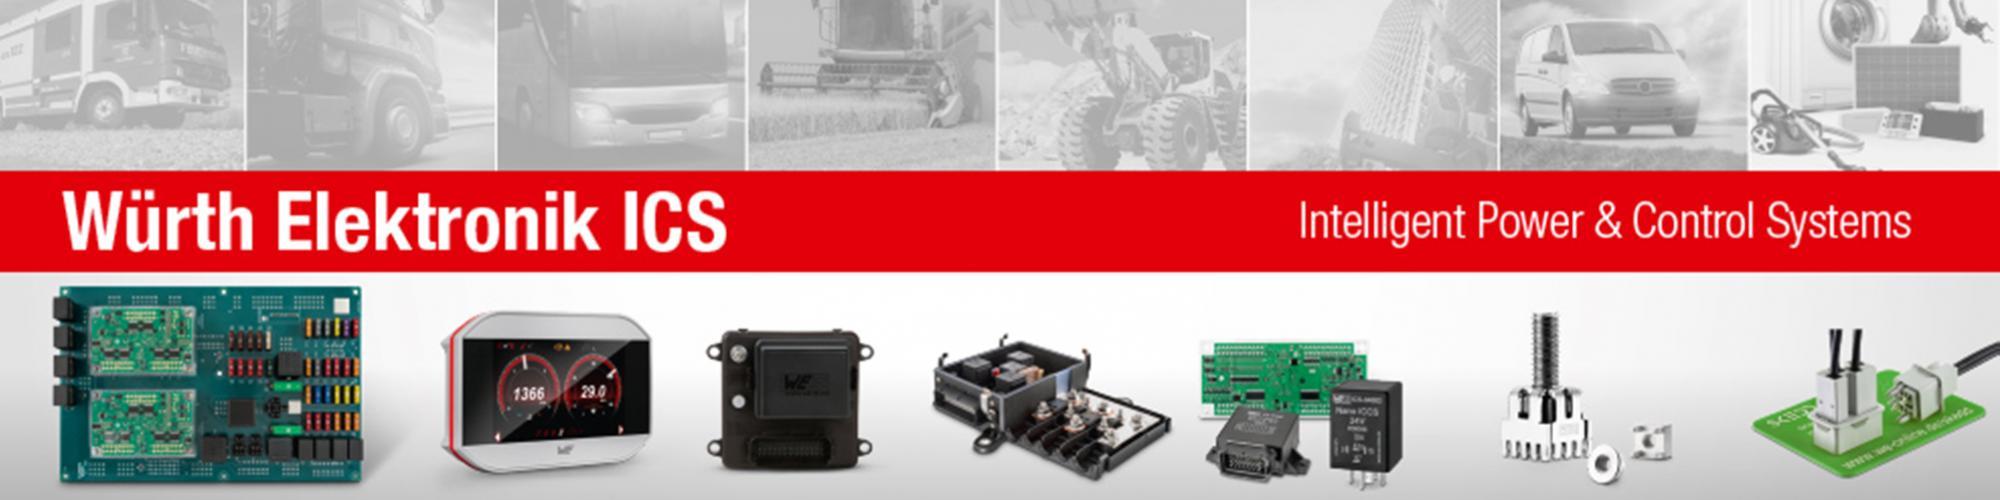 Würth Elektronik ICS GmbH & Co. KG Intelligent Power & Control Systems